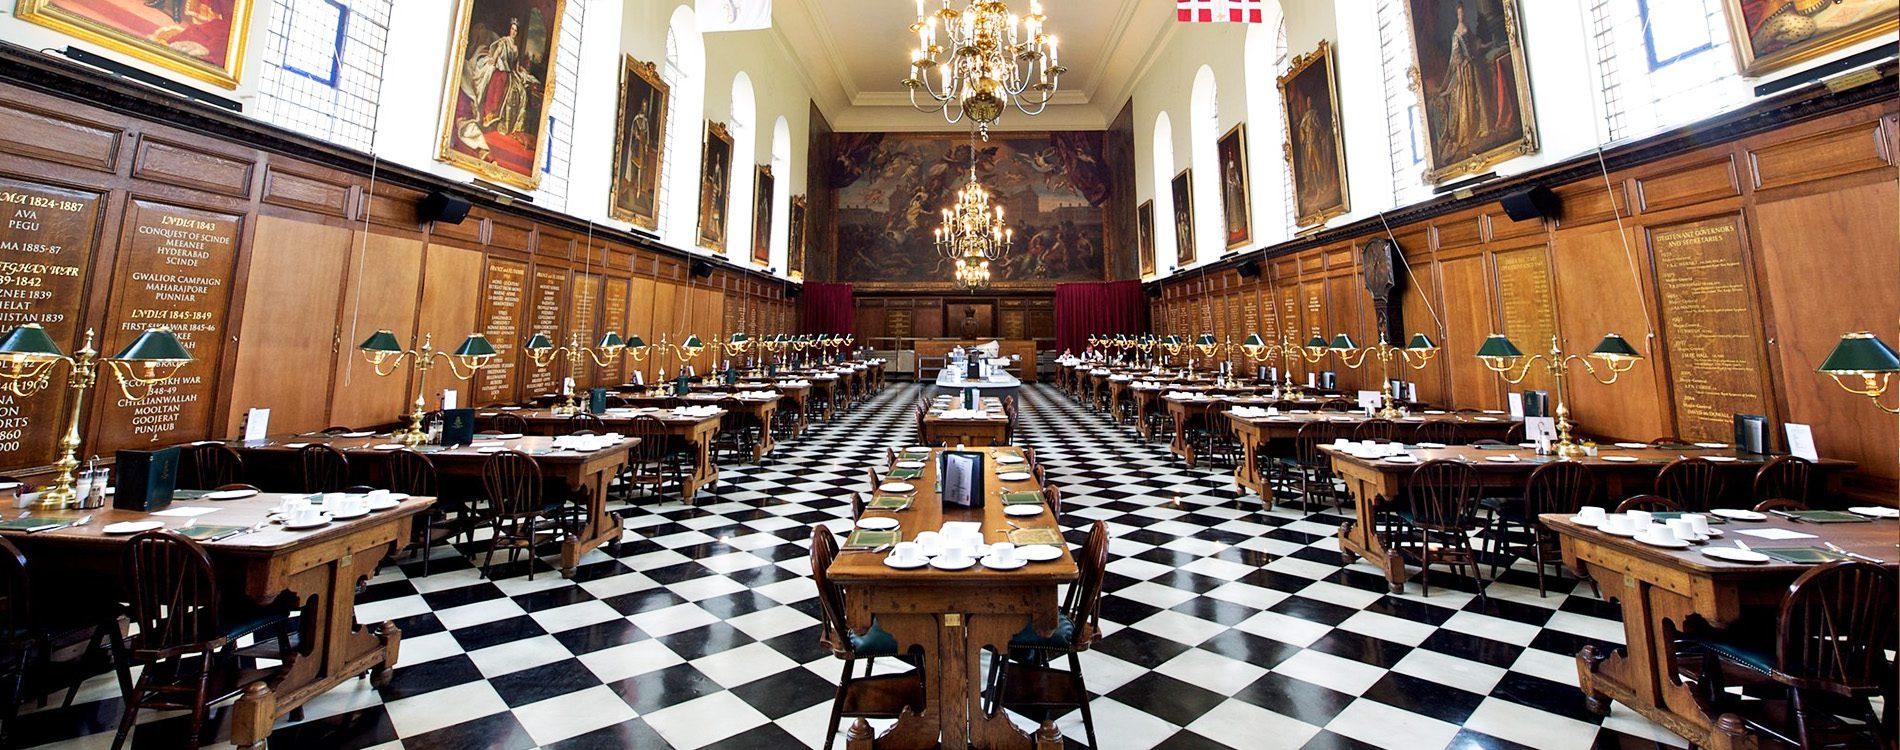 Huge open hall inside royal Chelsea hospital